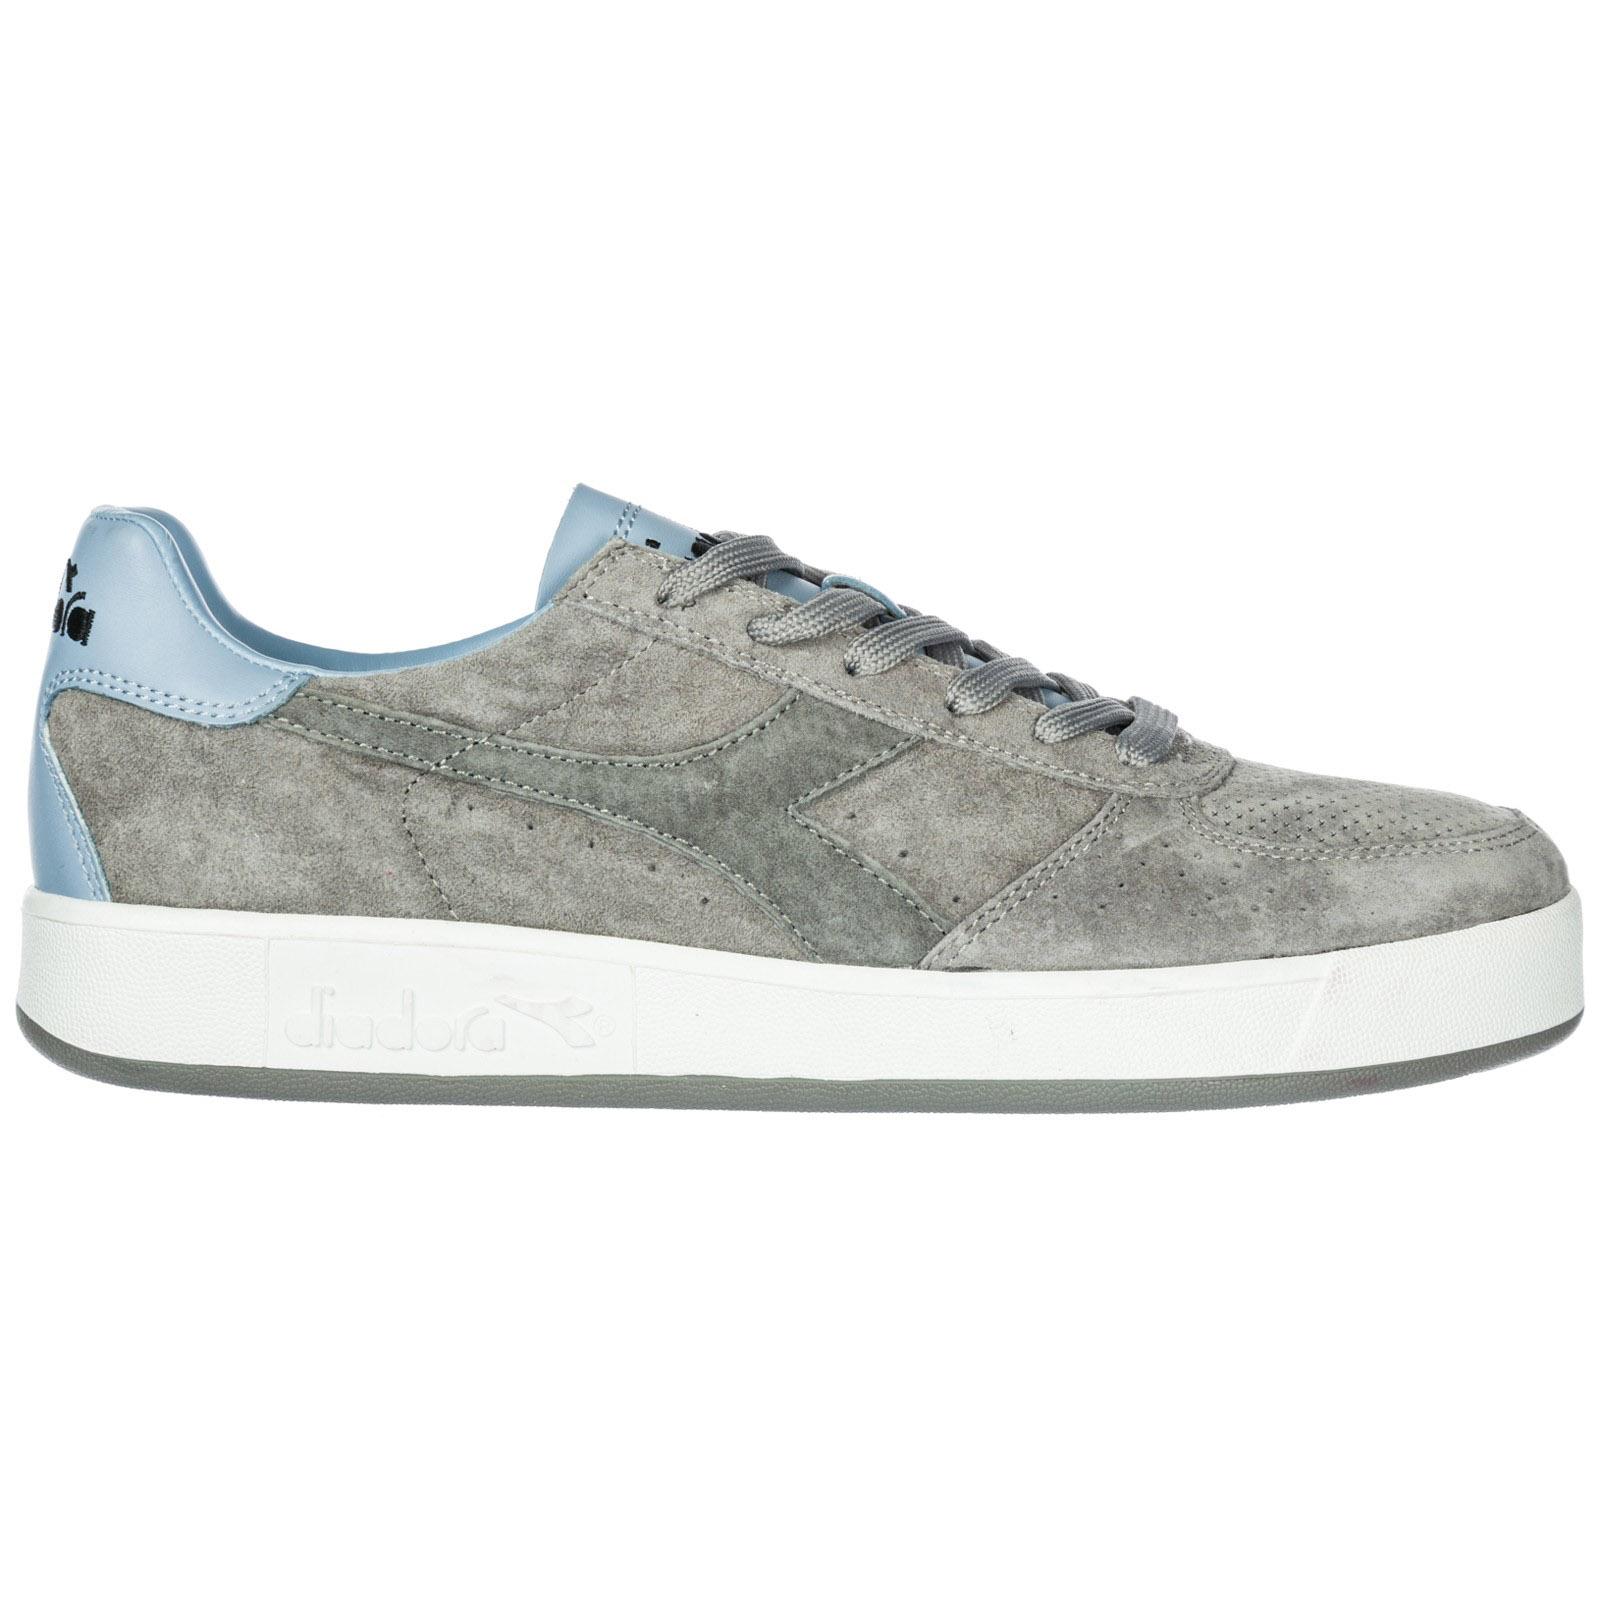 379c8b3b Men's shoes suede trainers sneakers b elite premium